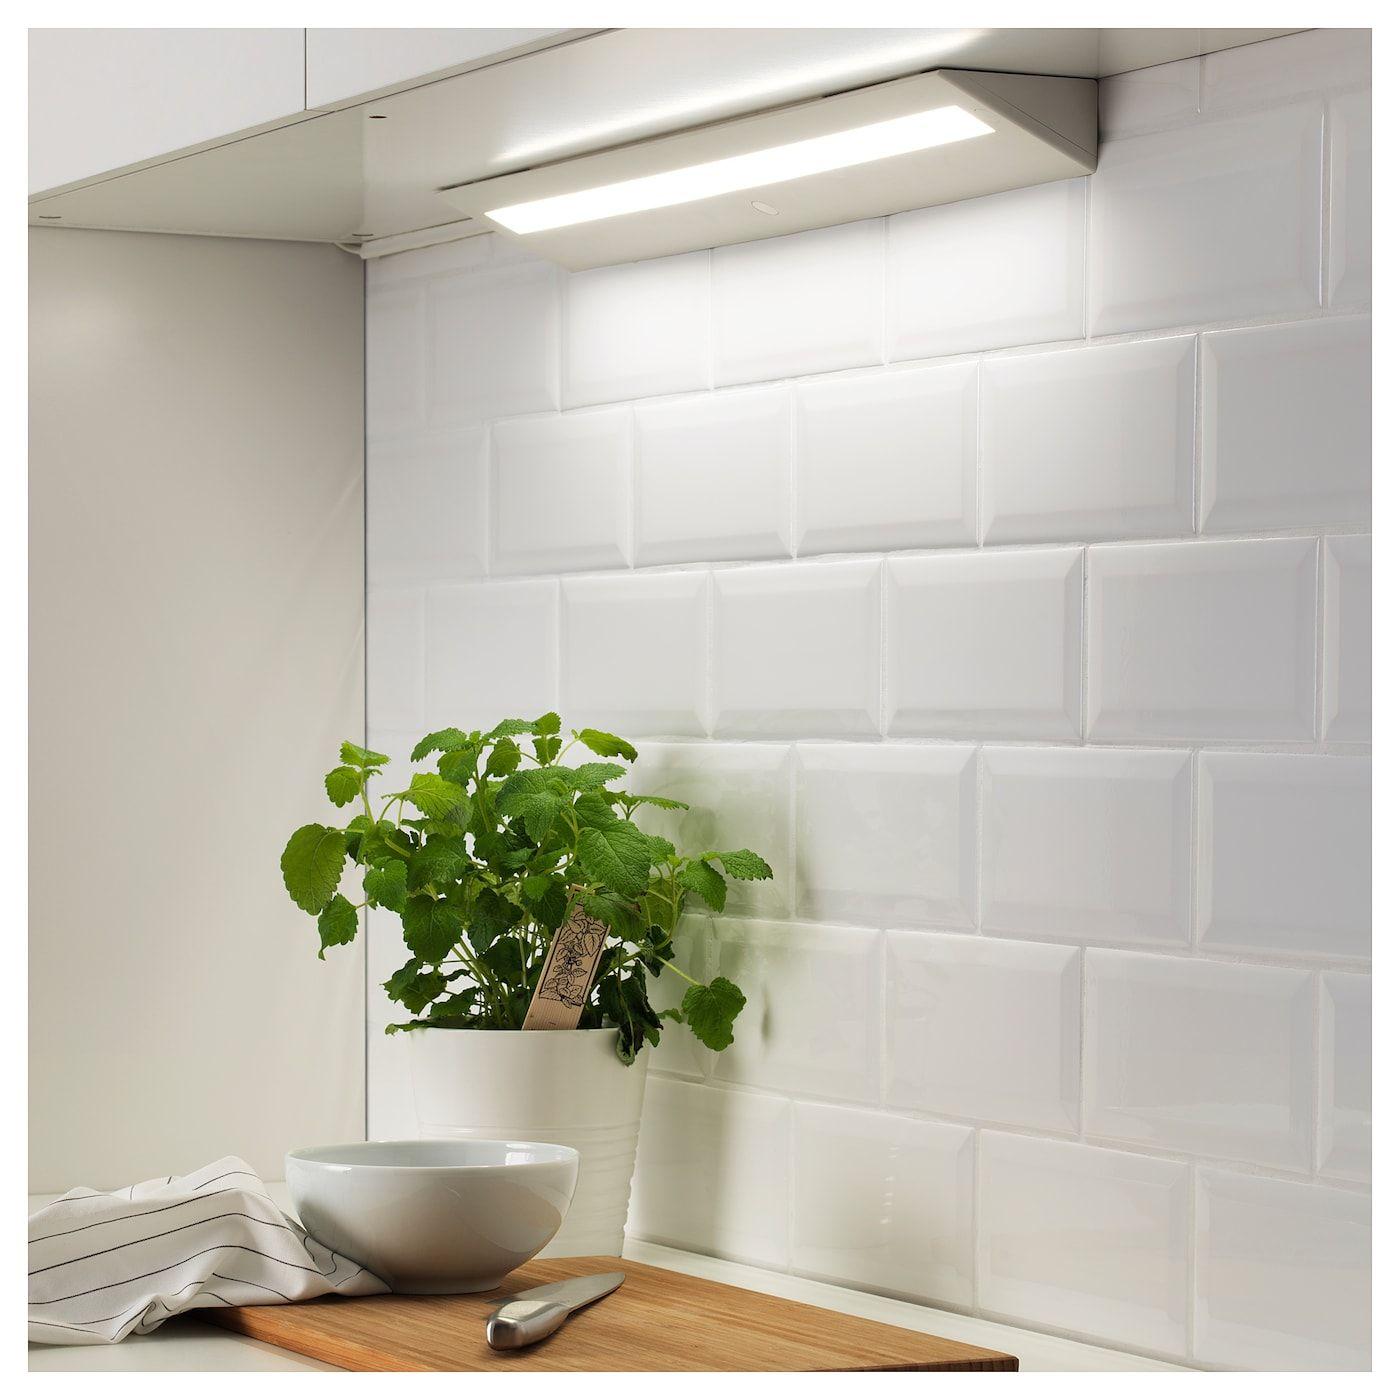 SLAGSIDA Arbeitsbeleuchtung, LED weiß  Arbeitsplatte, Led und